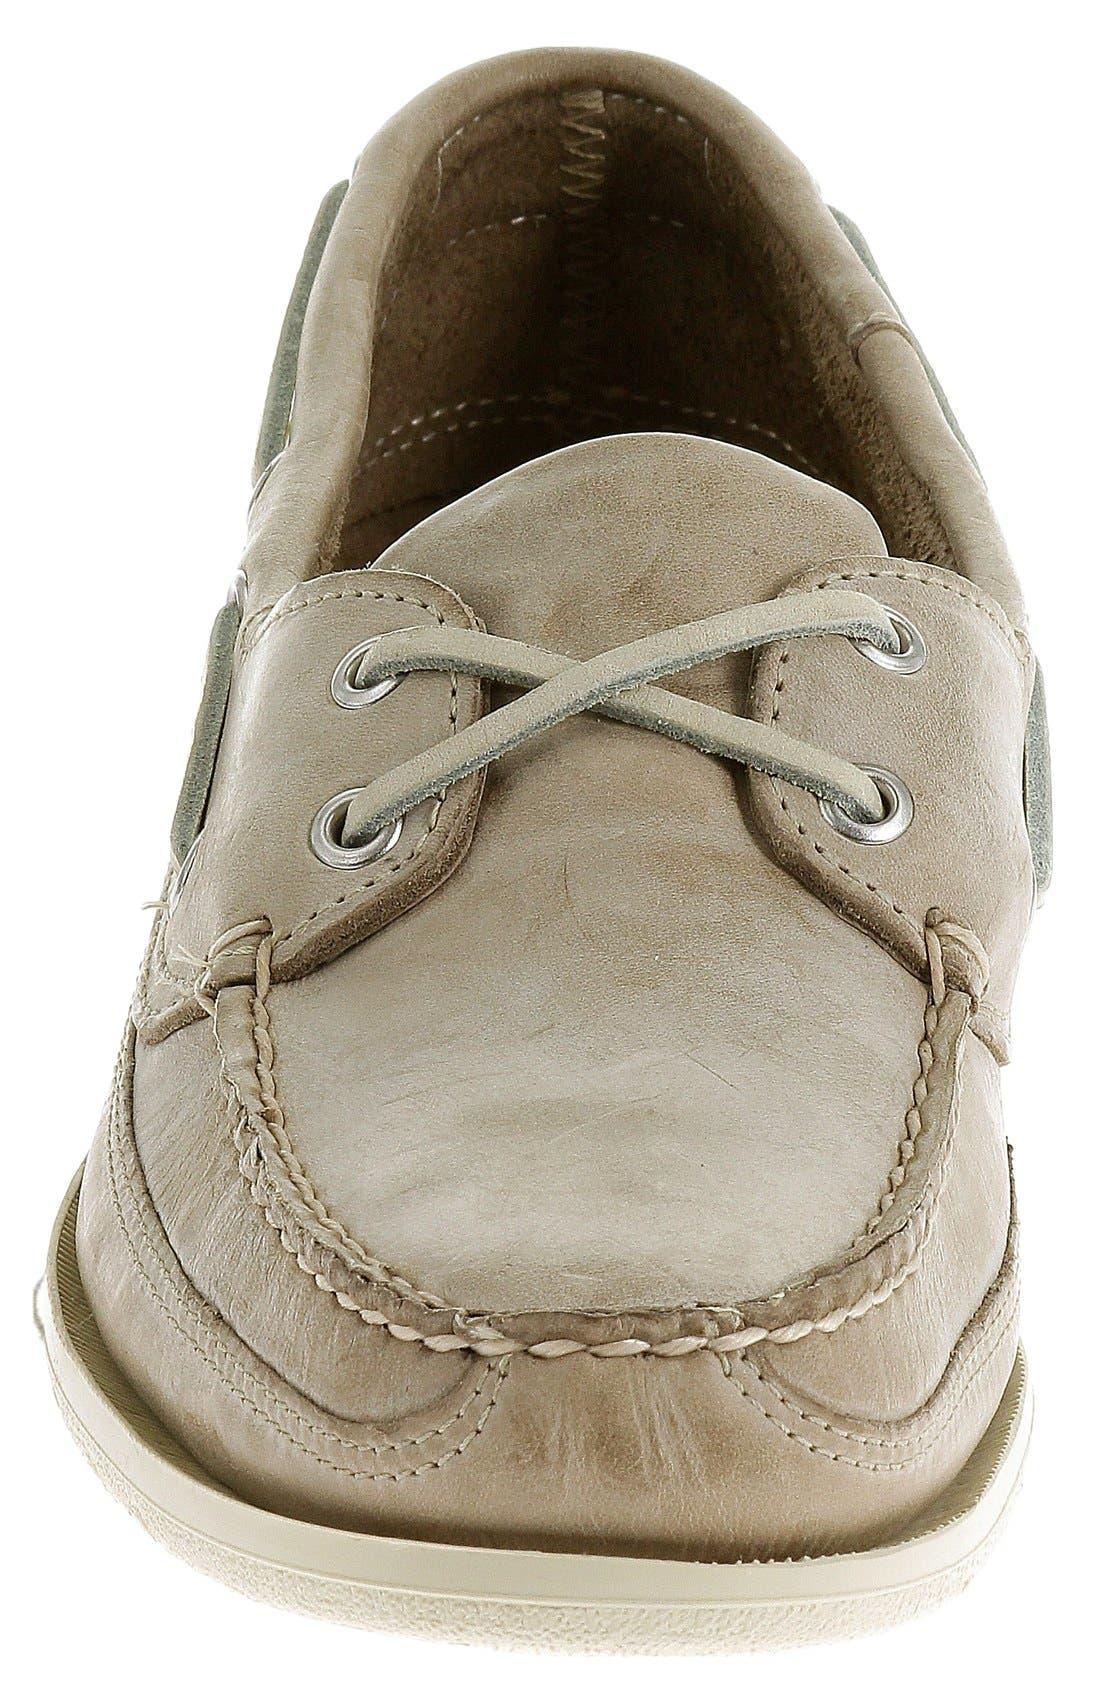 'Schooner' Boat Shoe,                             Alternate thumbnail 22, color,